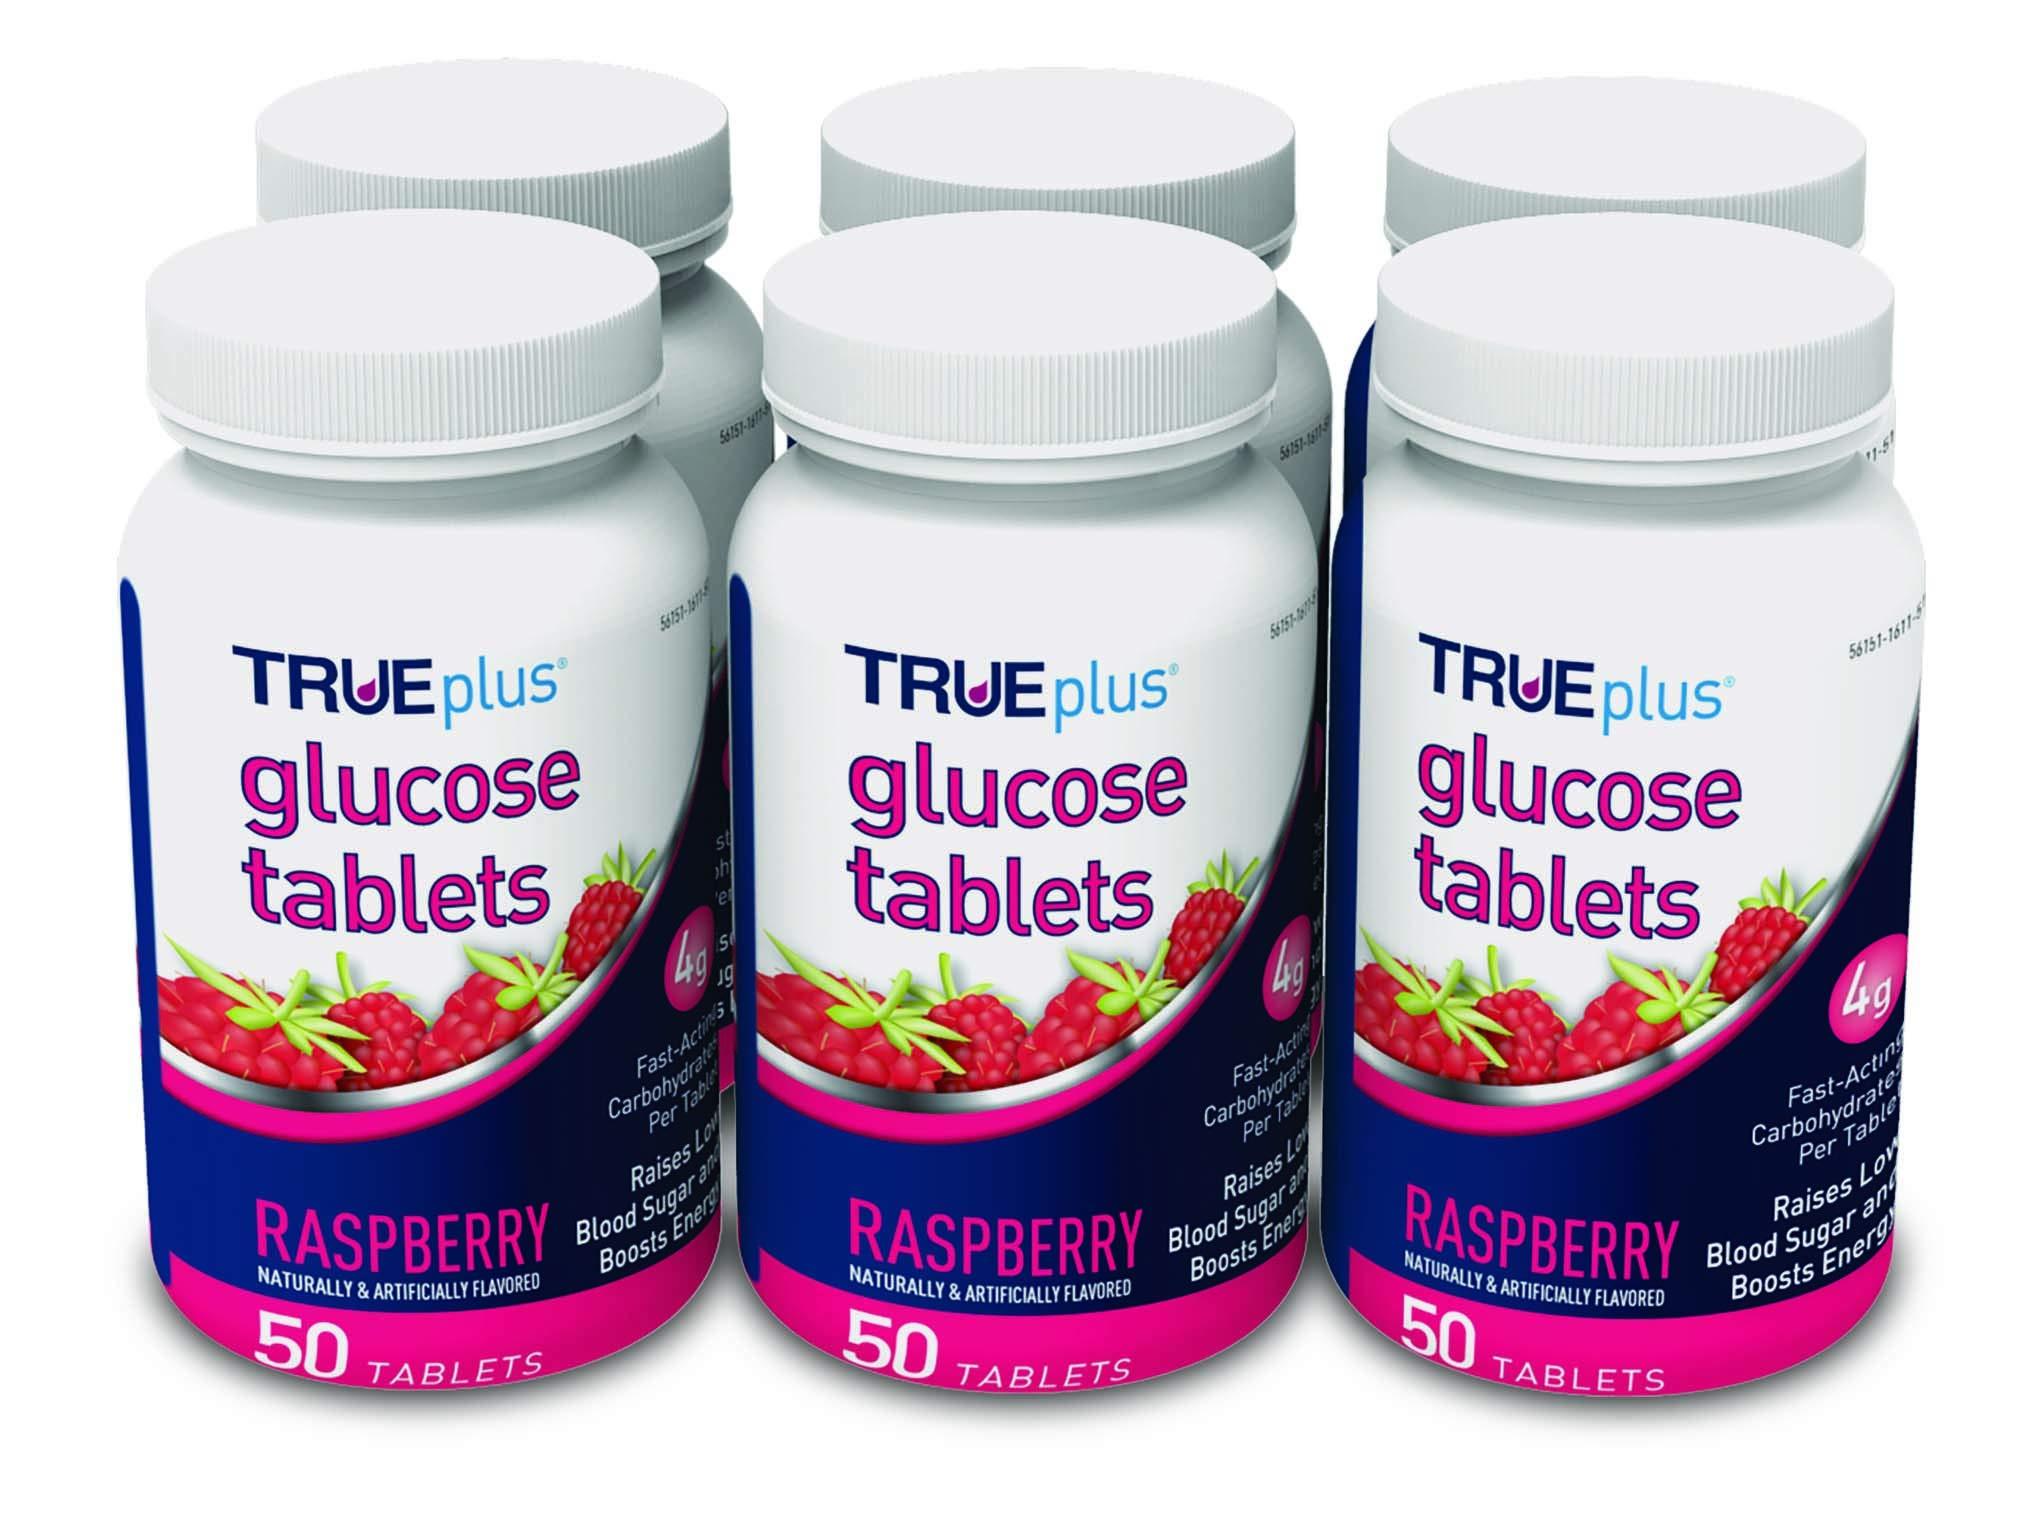 TRUEplus® Glucose Tablets, Raspberry Flavor - 50ct Bottle - 6 Pack by TRUEplus